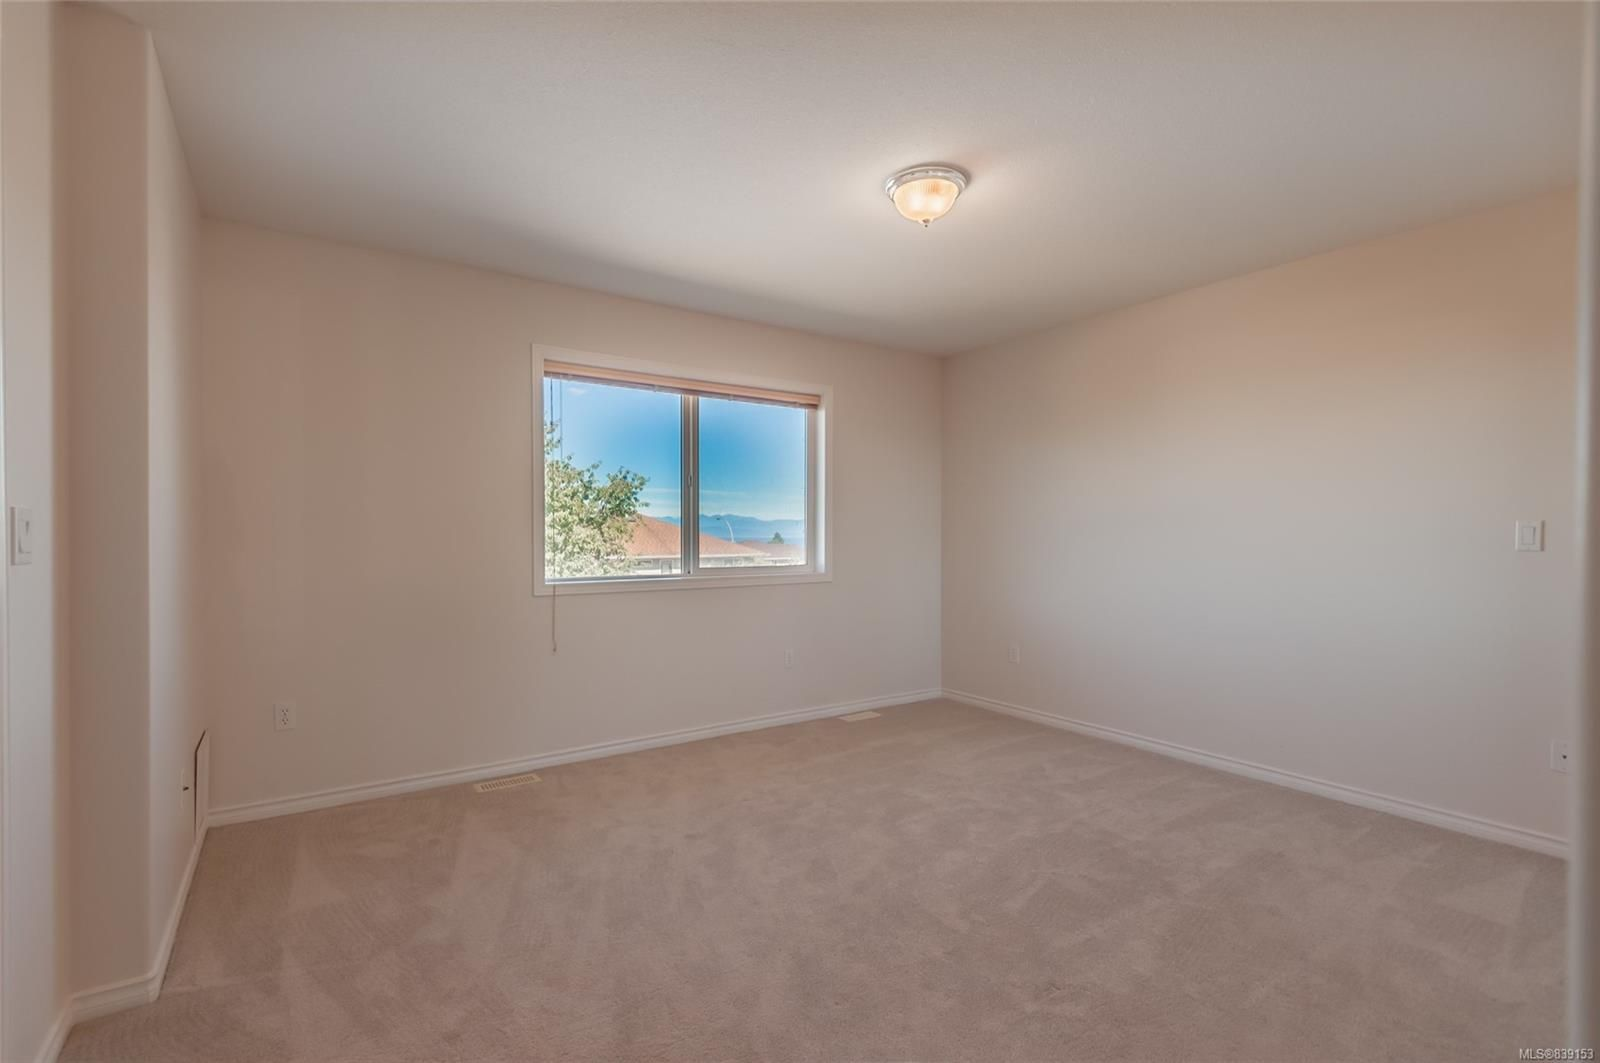 Photo 5: Photos: 6412 Dover Rd in NANAIMO: Na North Nanaimo House for sale (Nanaimo)  : MLS®# 839153